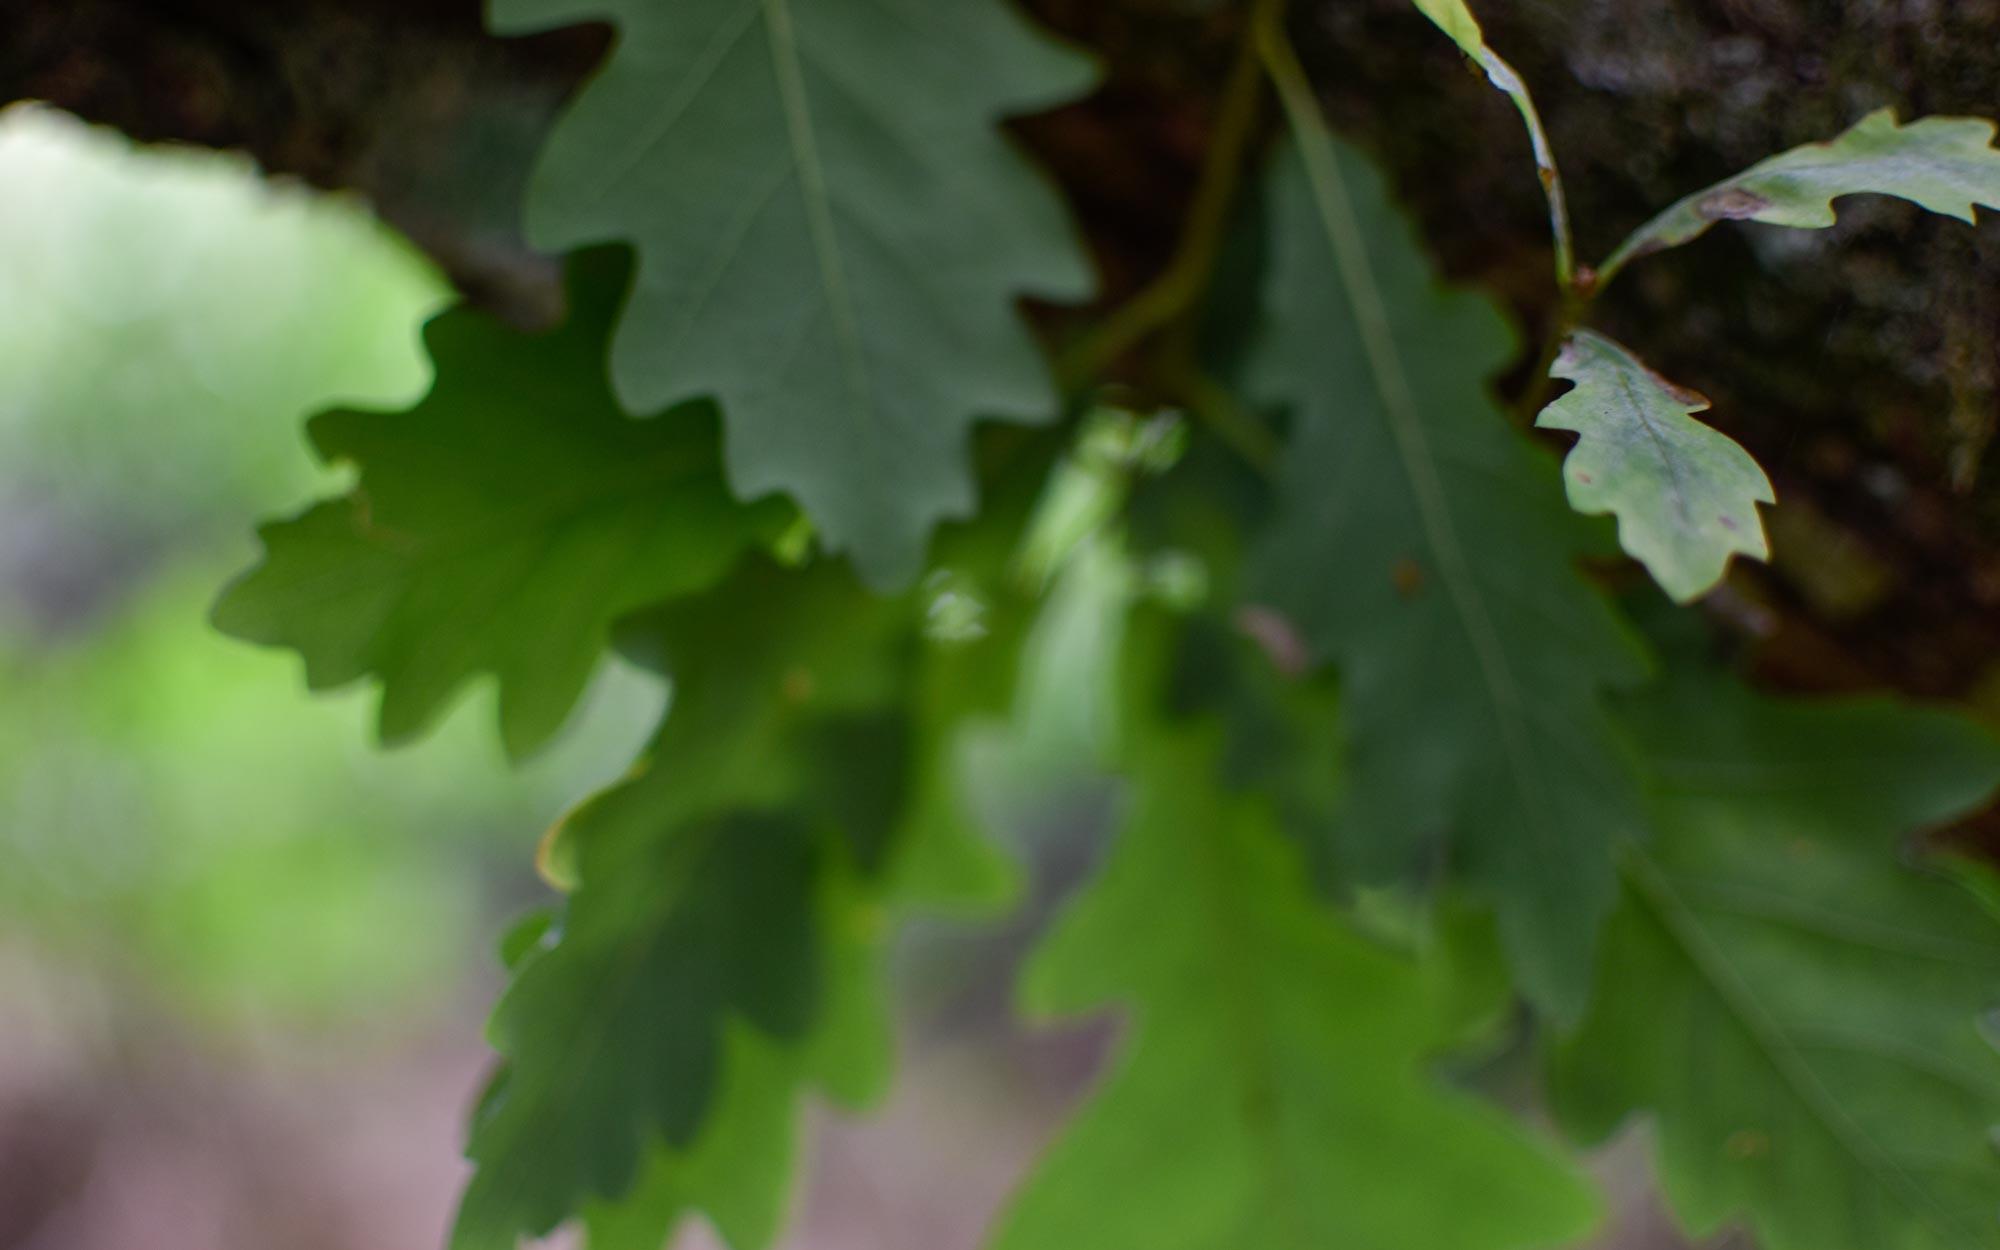 Oaks-leaves